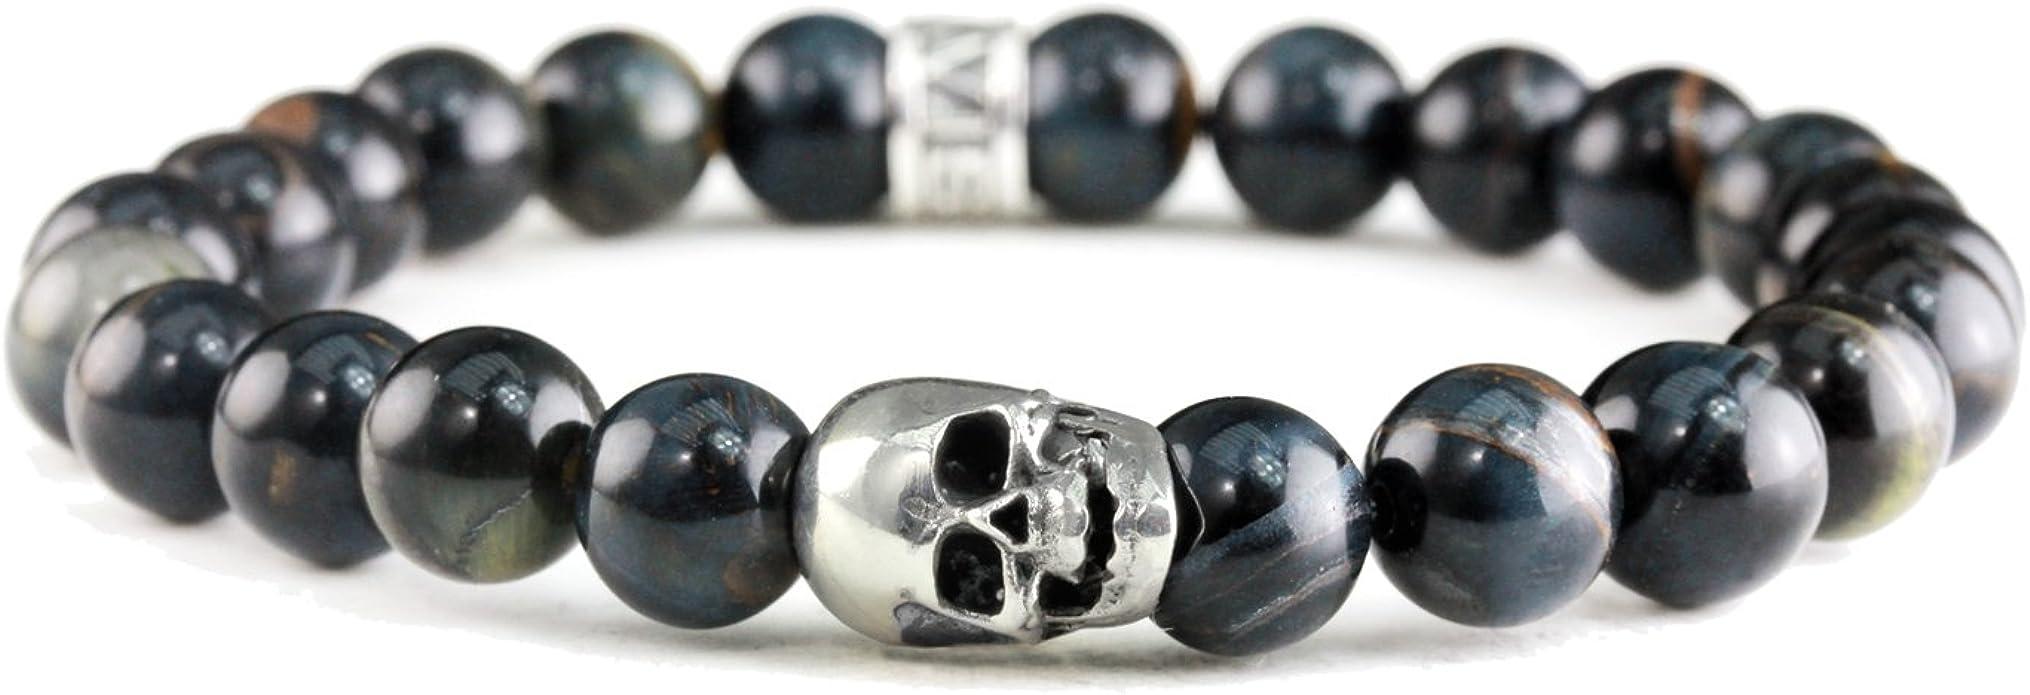 Acheter bracelet tete de mort online 12